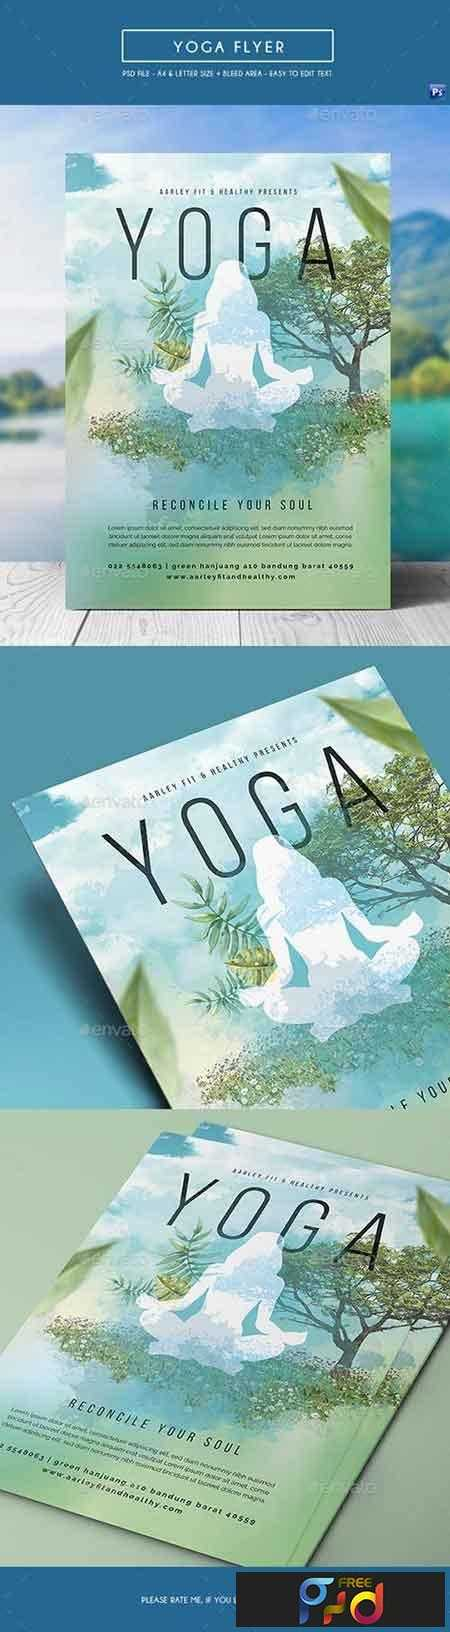 1807211 Yoga Flyer 17308230 1